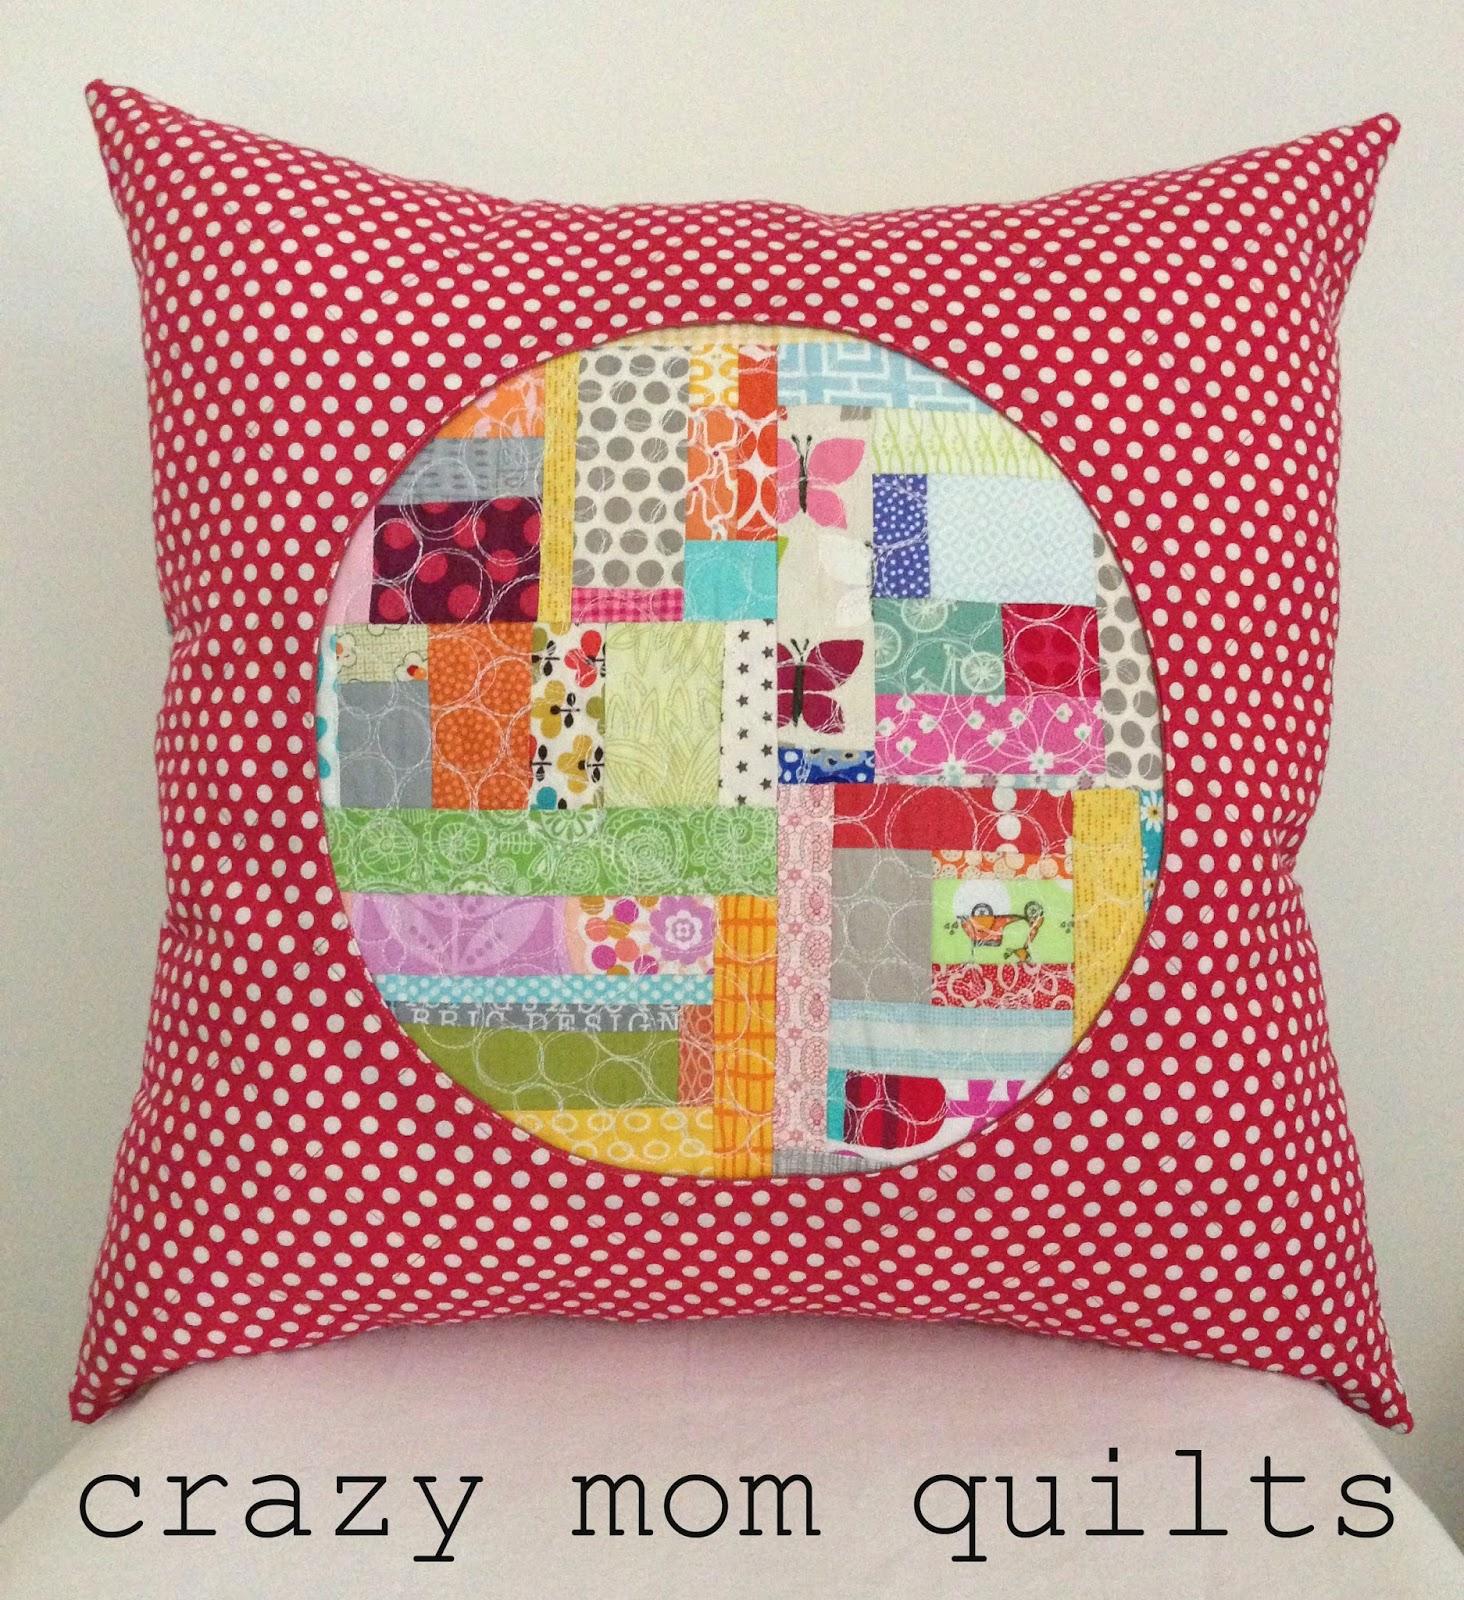 Crazy Mom Quilts Porthole Pillow